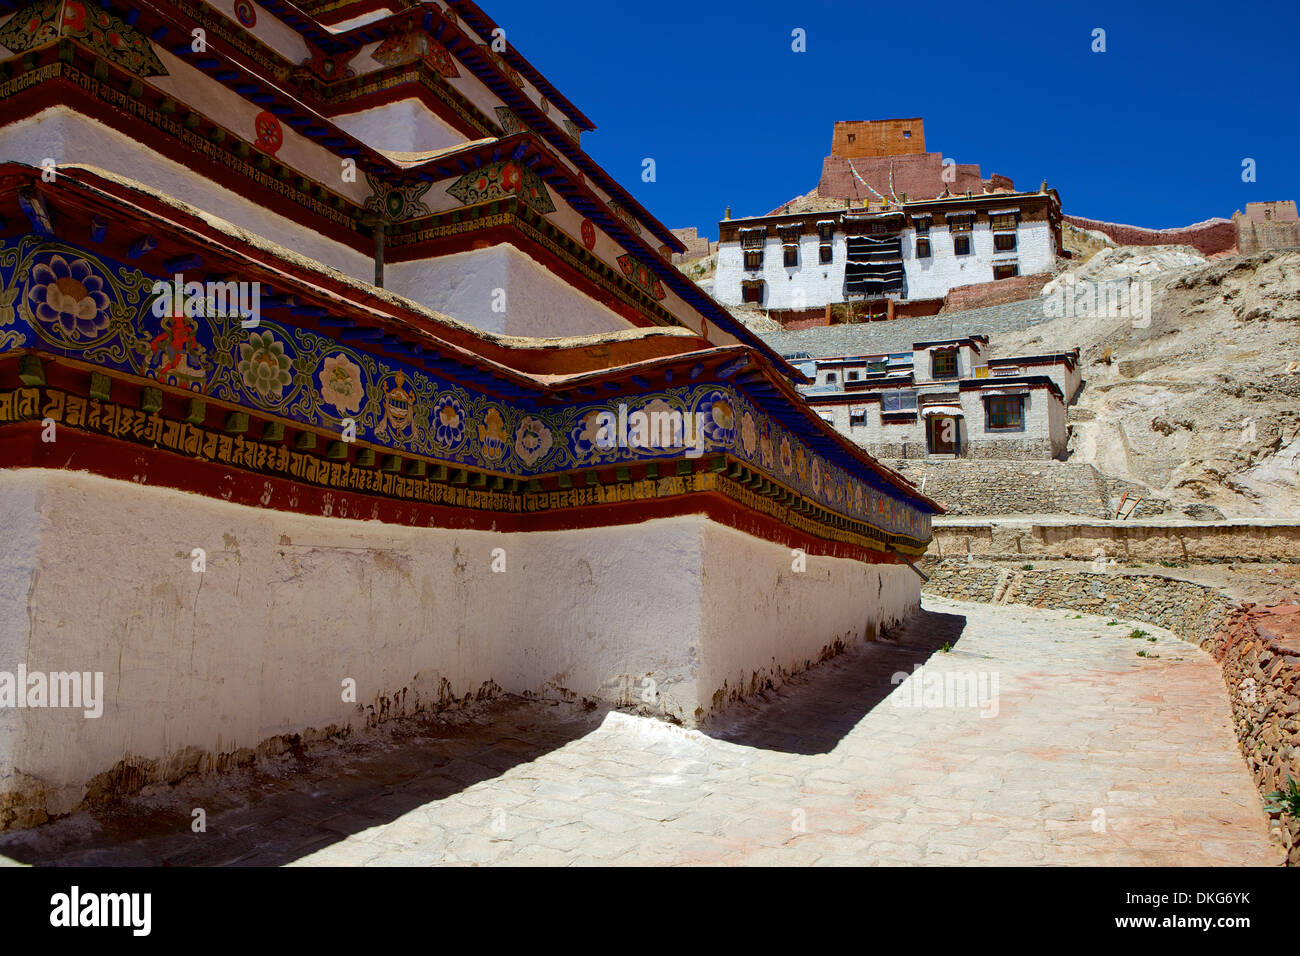 The base of Kumbum chorten (Stupa) in the Palcho Monastery at Gyantse, Tibet, China, Asia - Stock Image